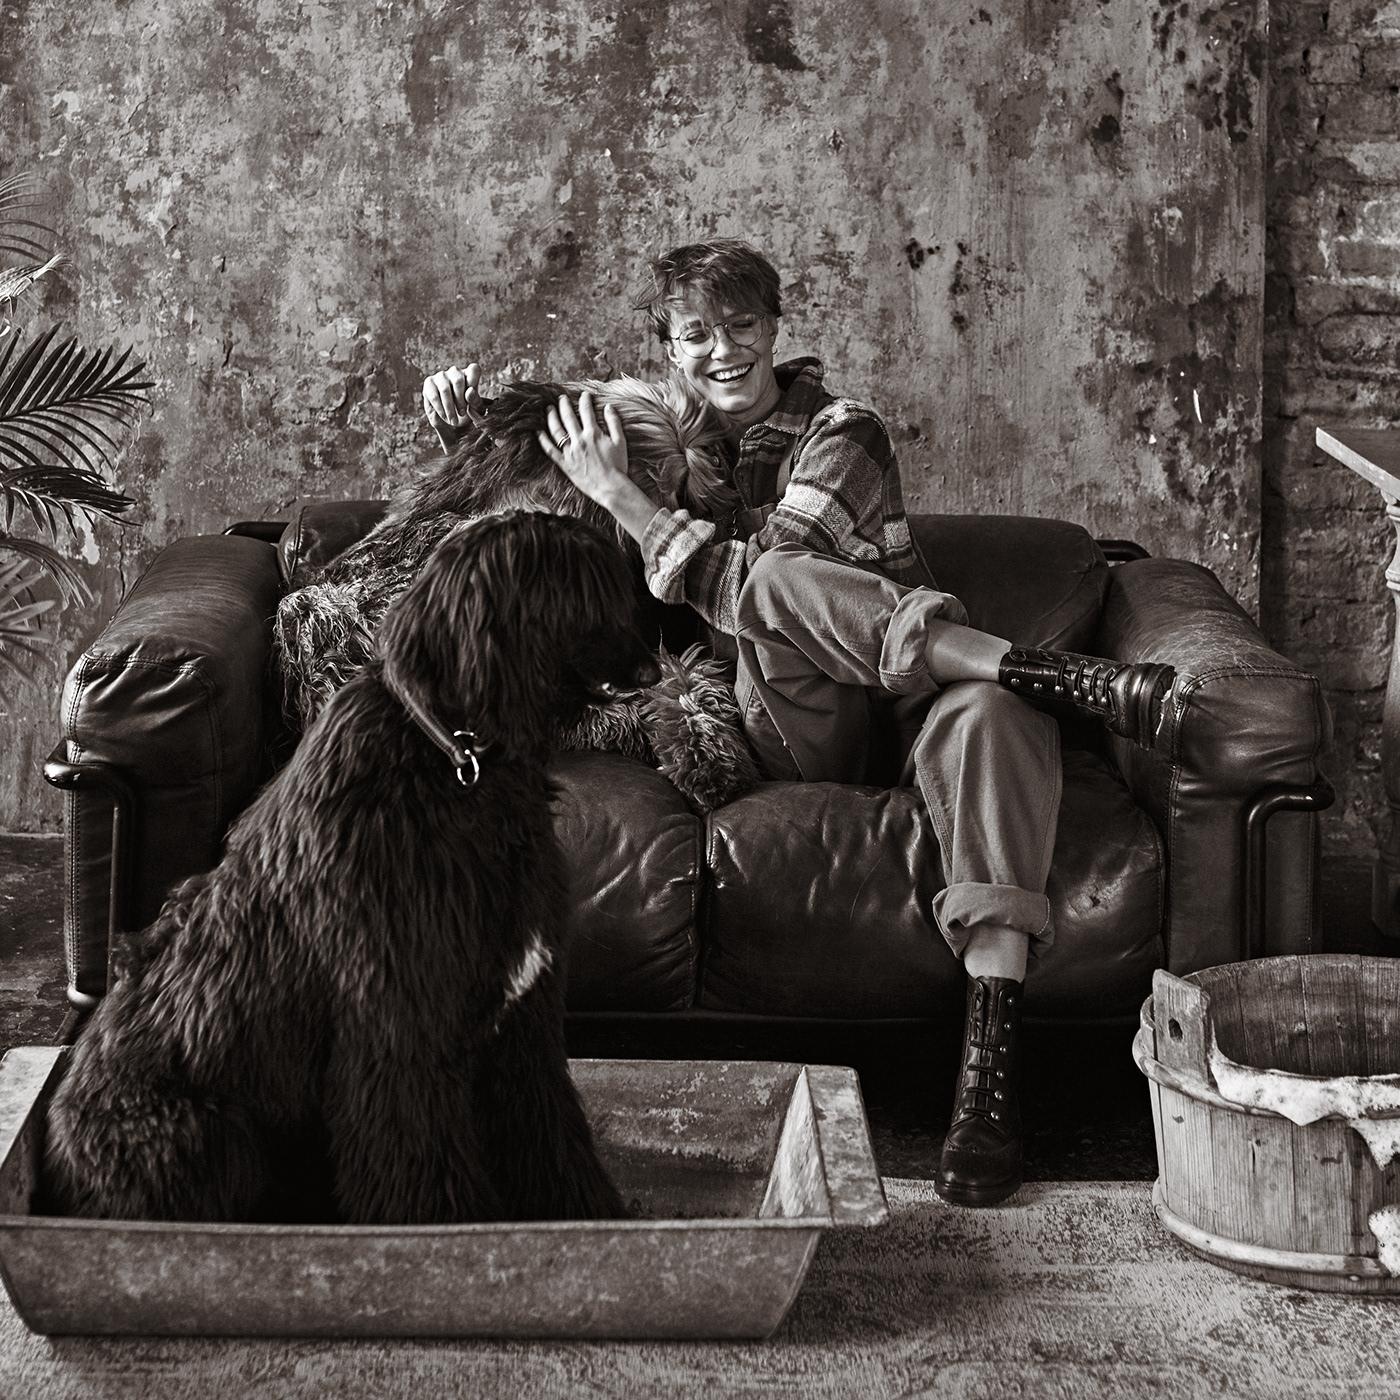 Chucha the Groomer / фотограф Игорь Новиков модель Оксана Чуча